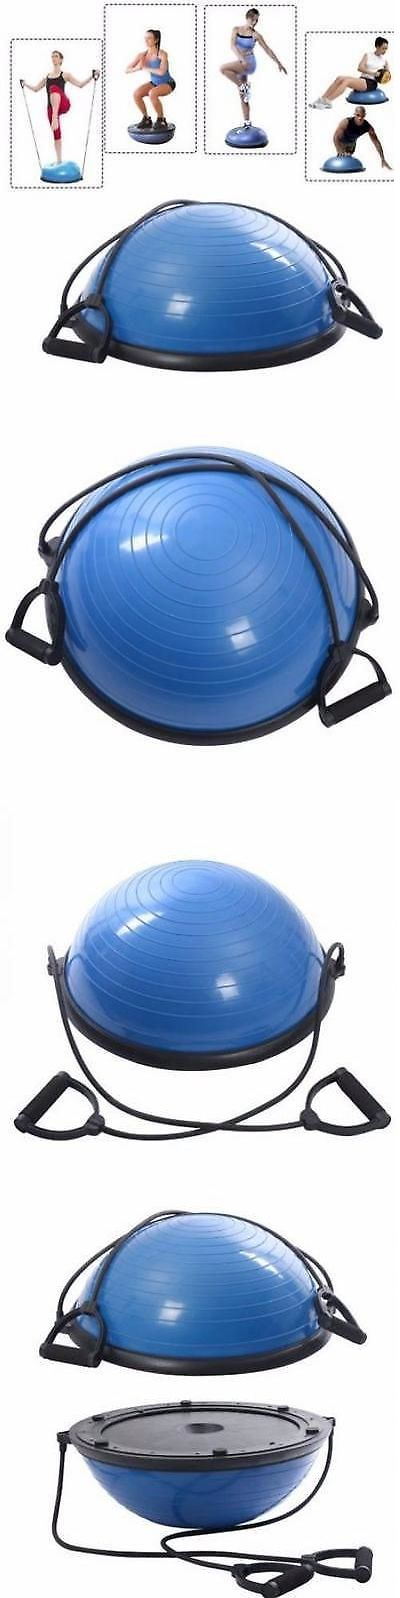 Balance Trainers 179803: Bosu Balance Ball Trainer Strength Training Equipment Yoga Endurance Workout -> BUY IT NOW ONLY: $57.73 on eBay!